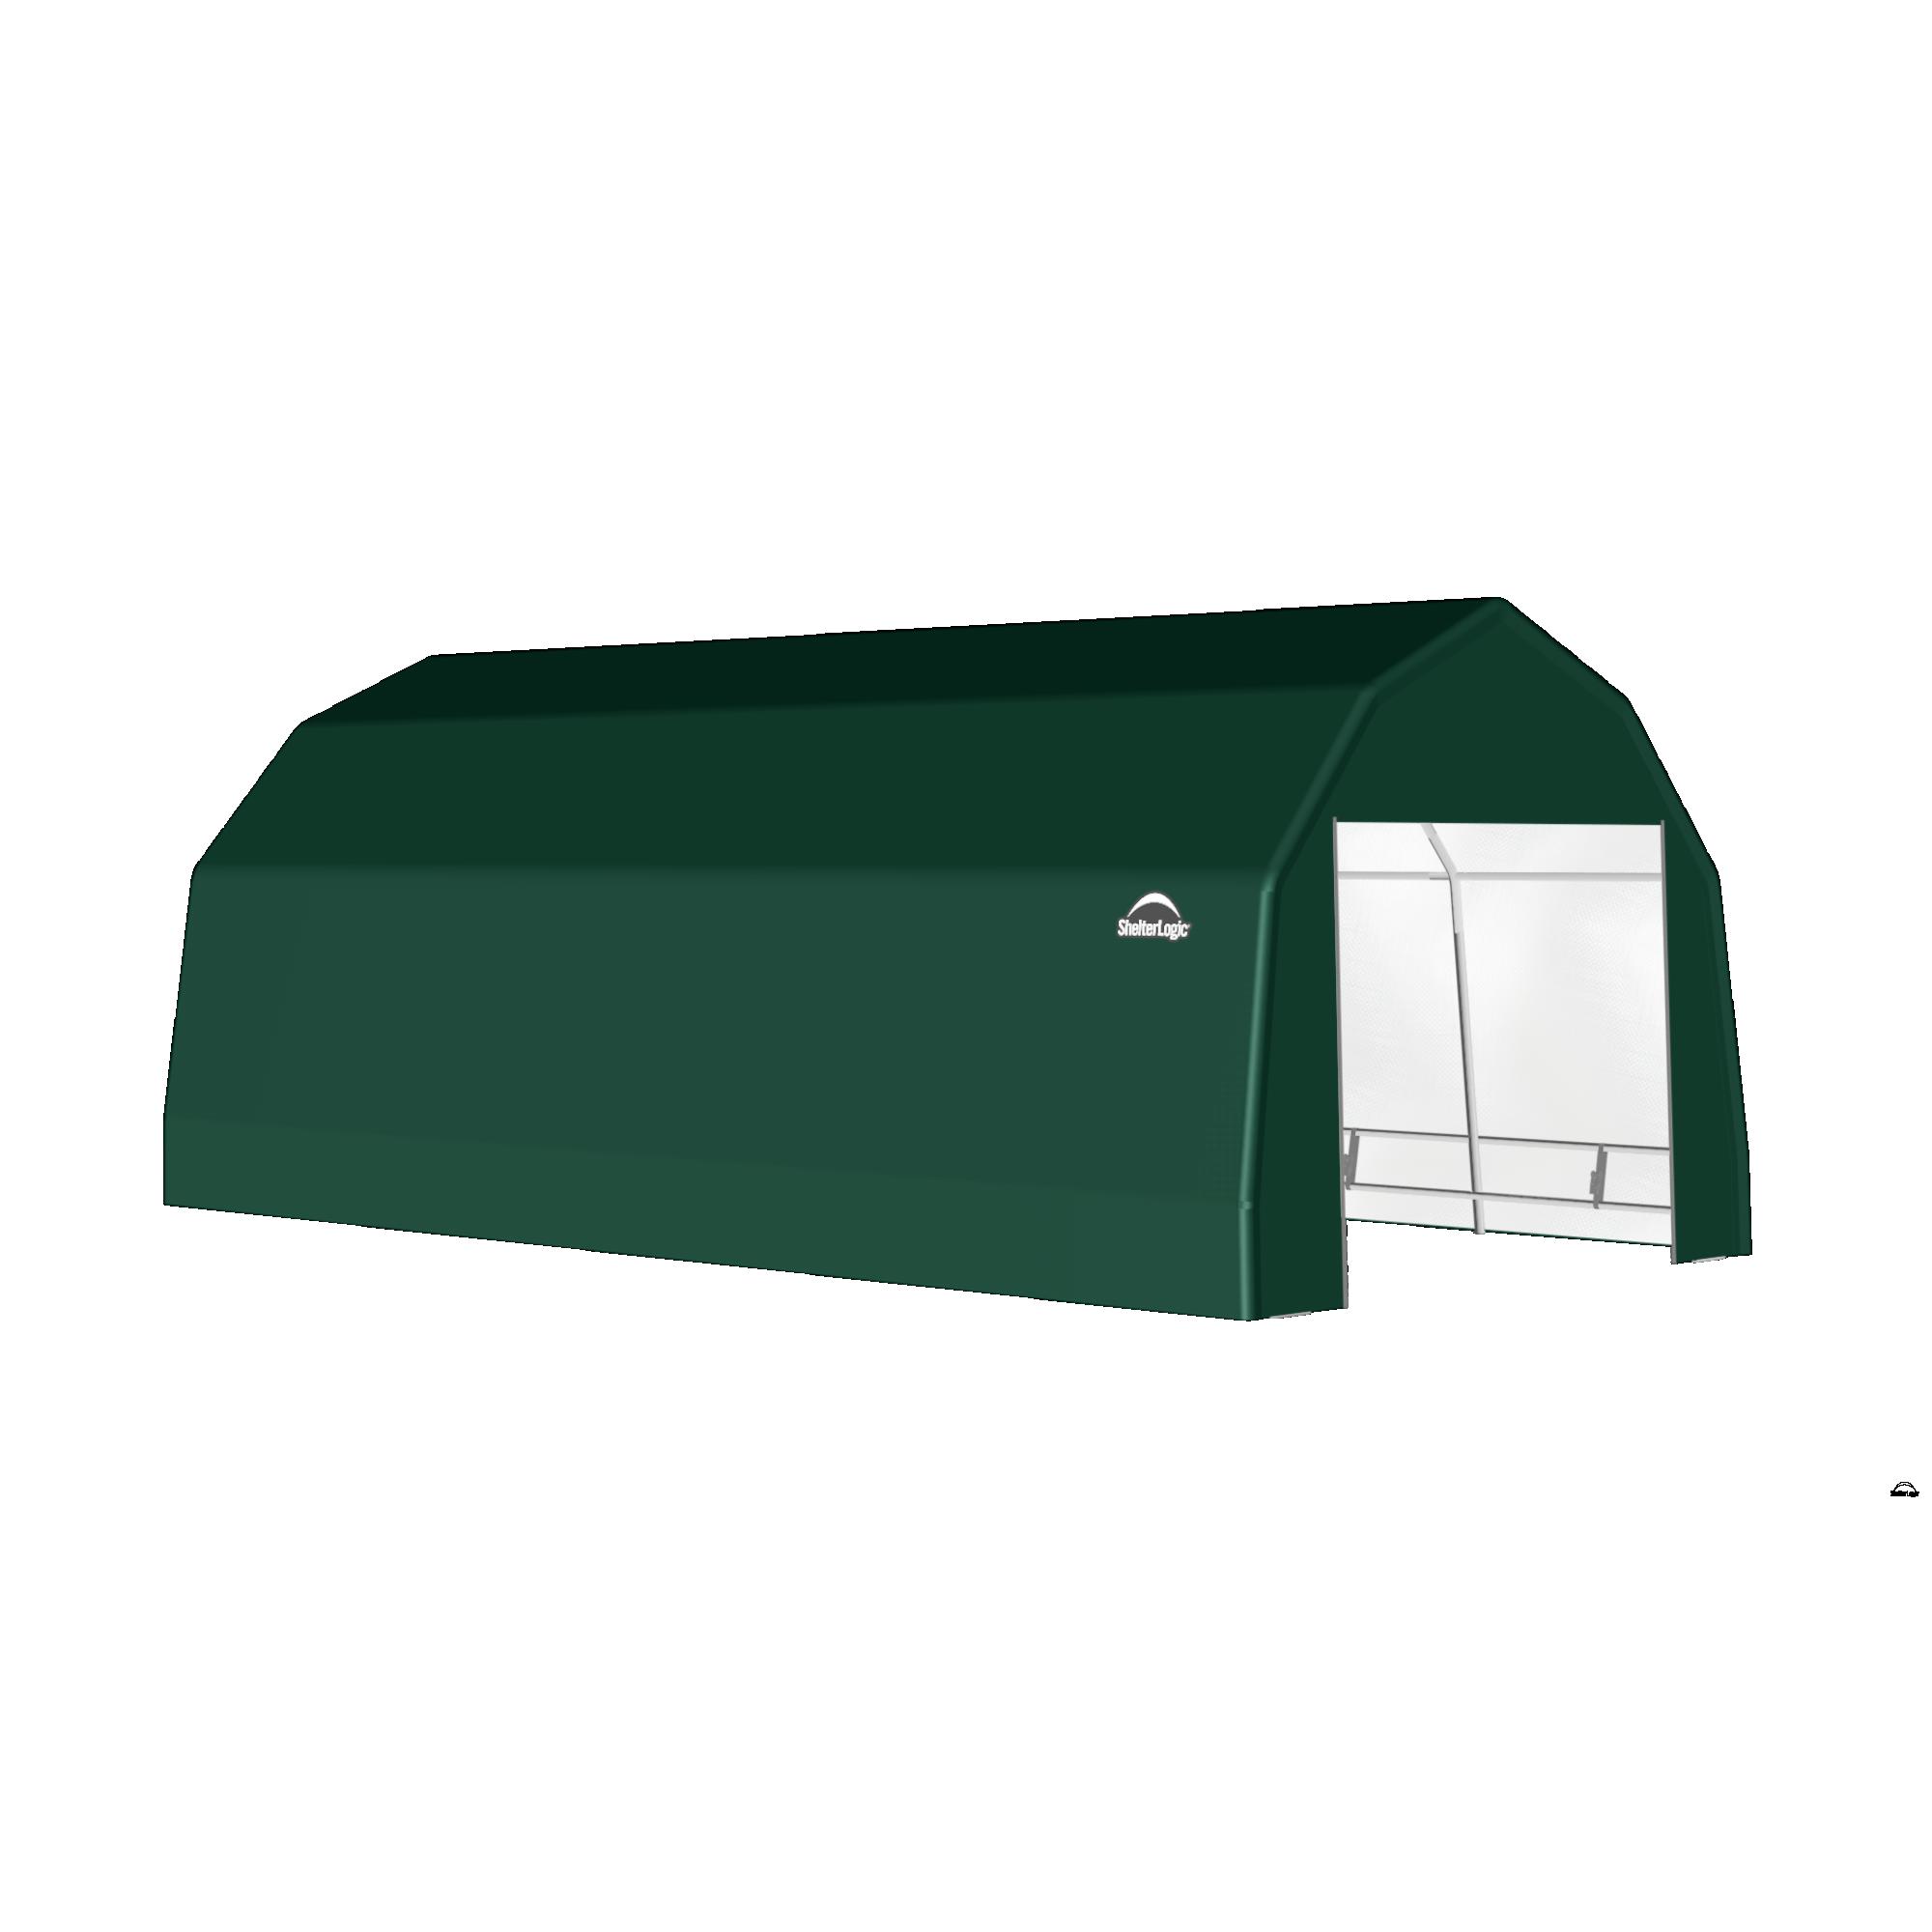 SP Barn 12X24X9 Green 14 oz PE Shelter